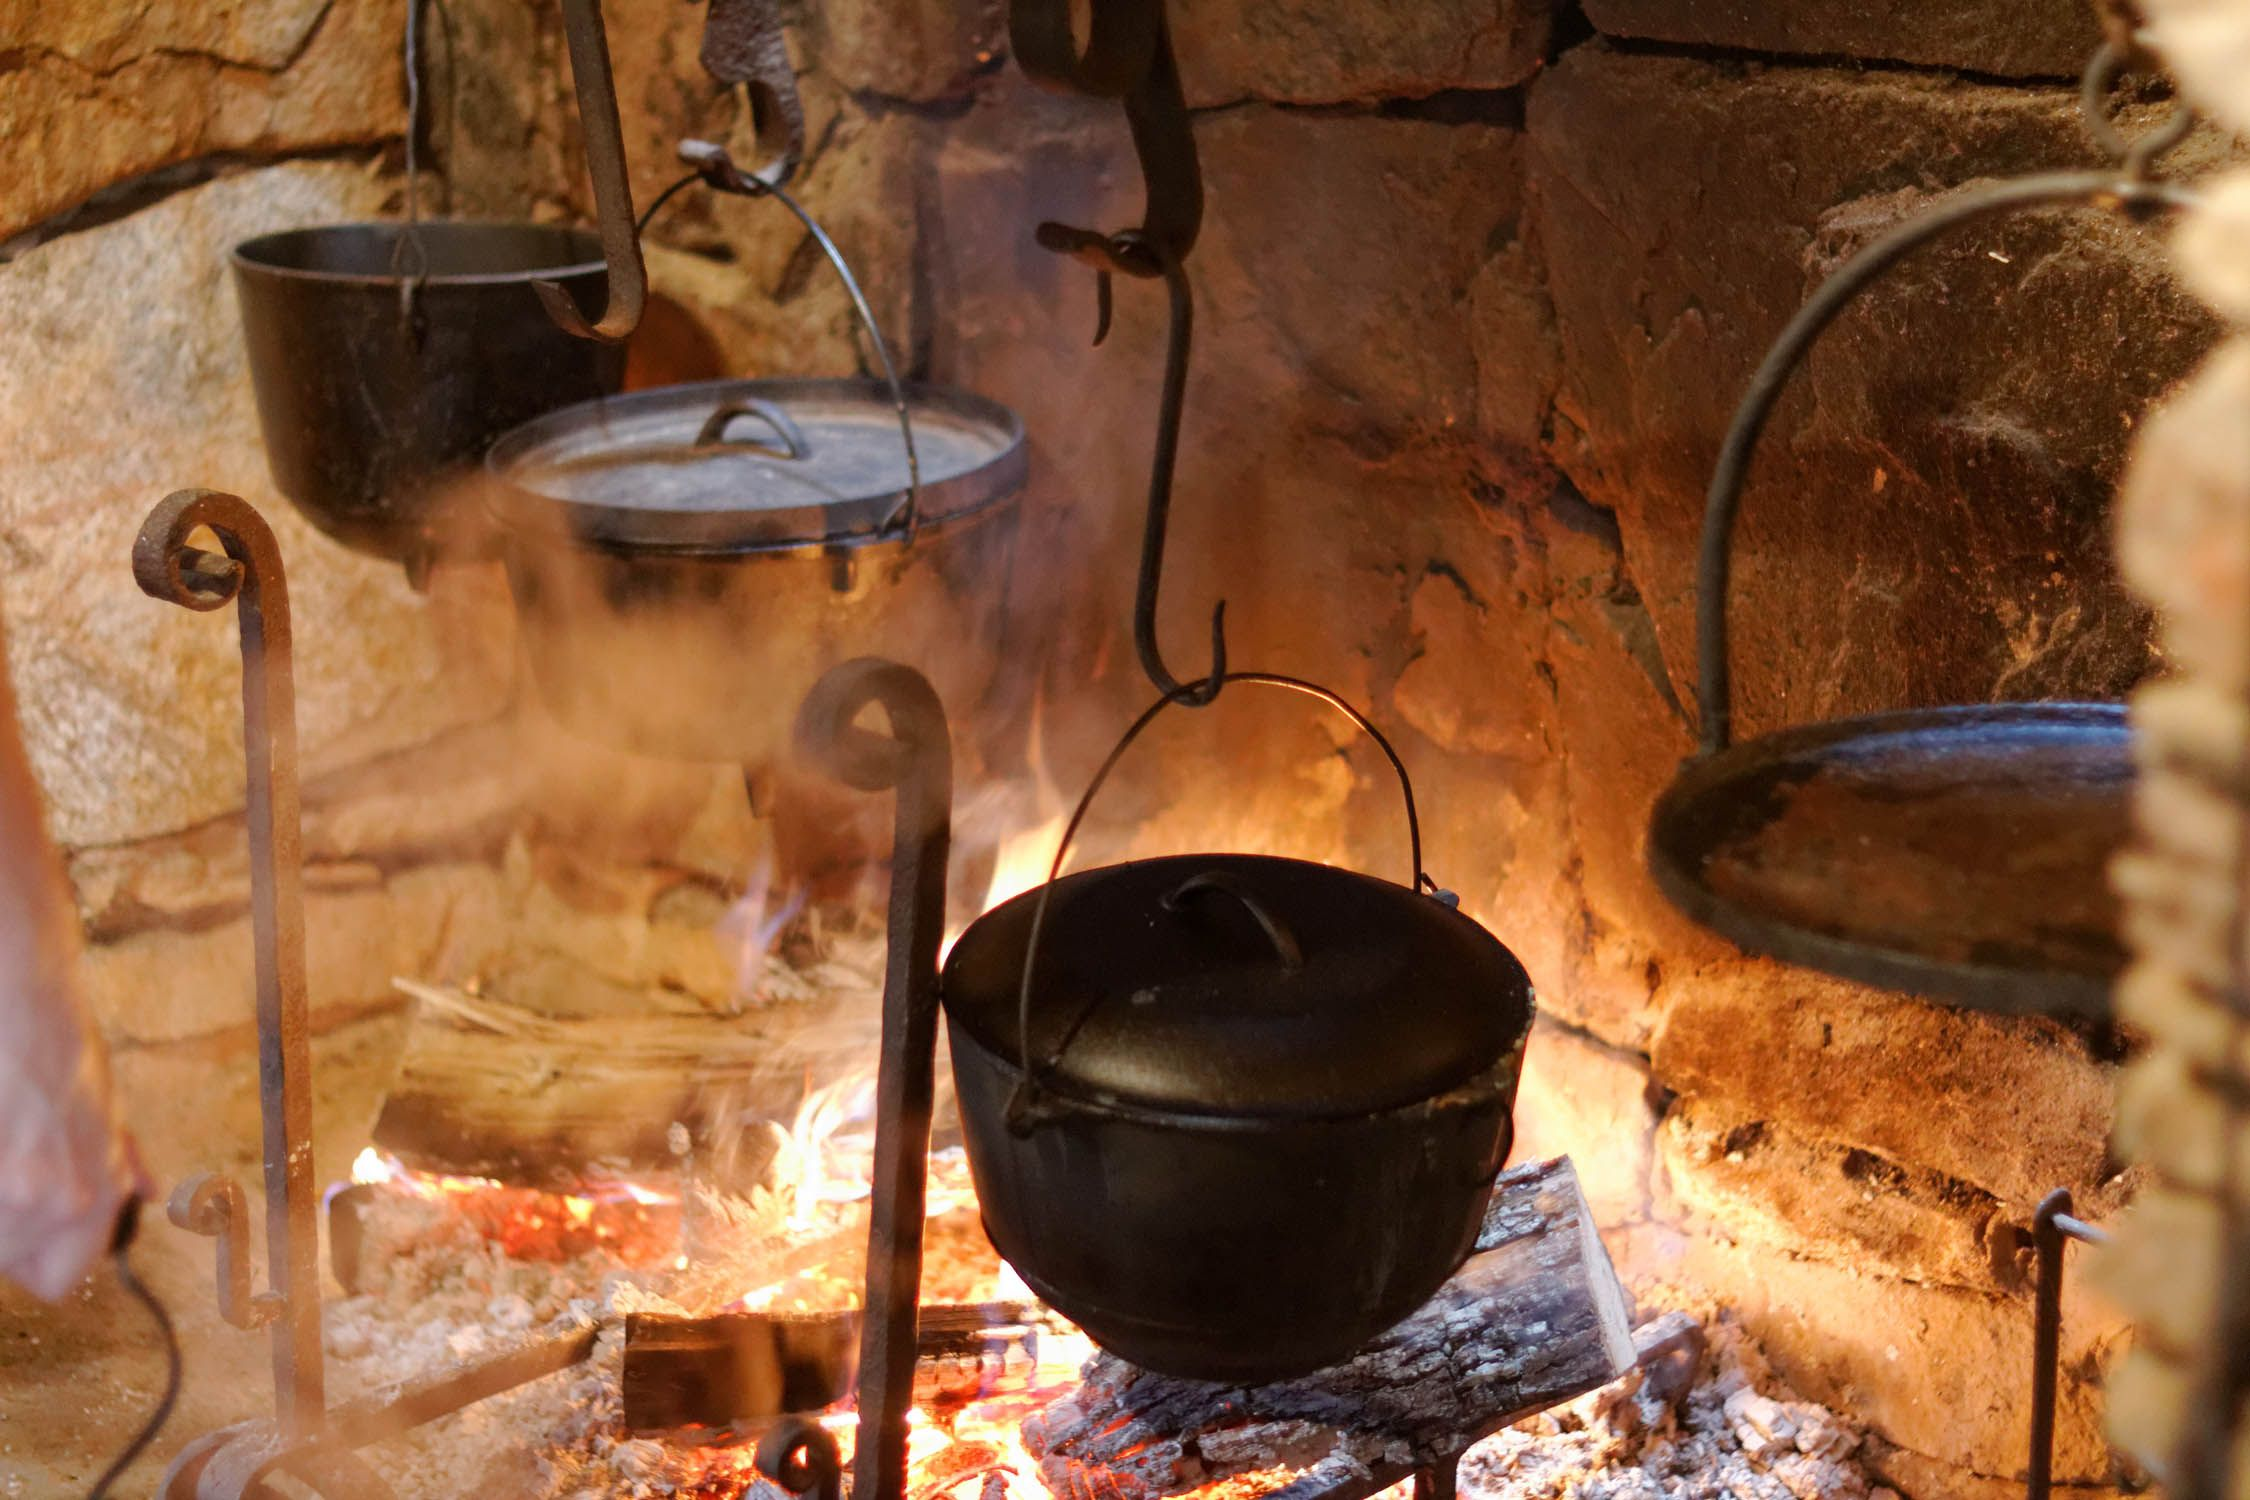 river rockopen cooking hearth - Google Search | cabin | Pinterest ...